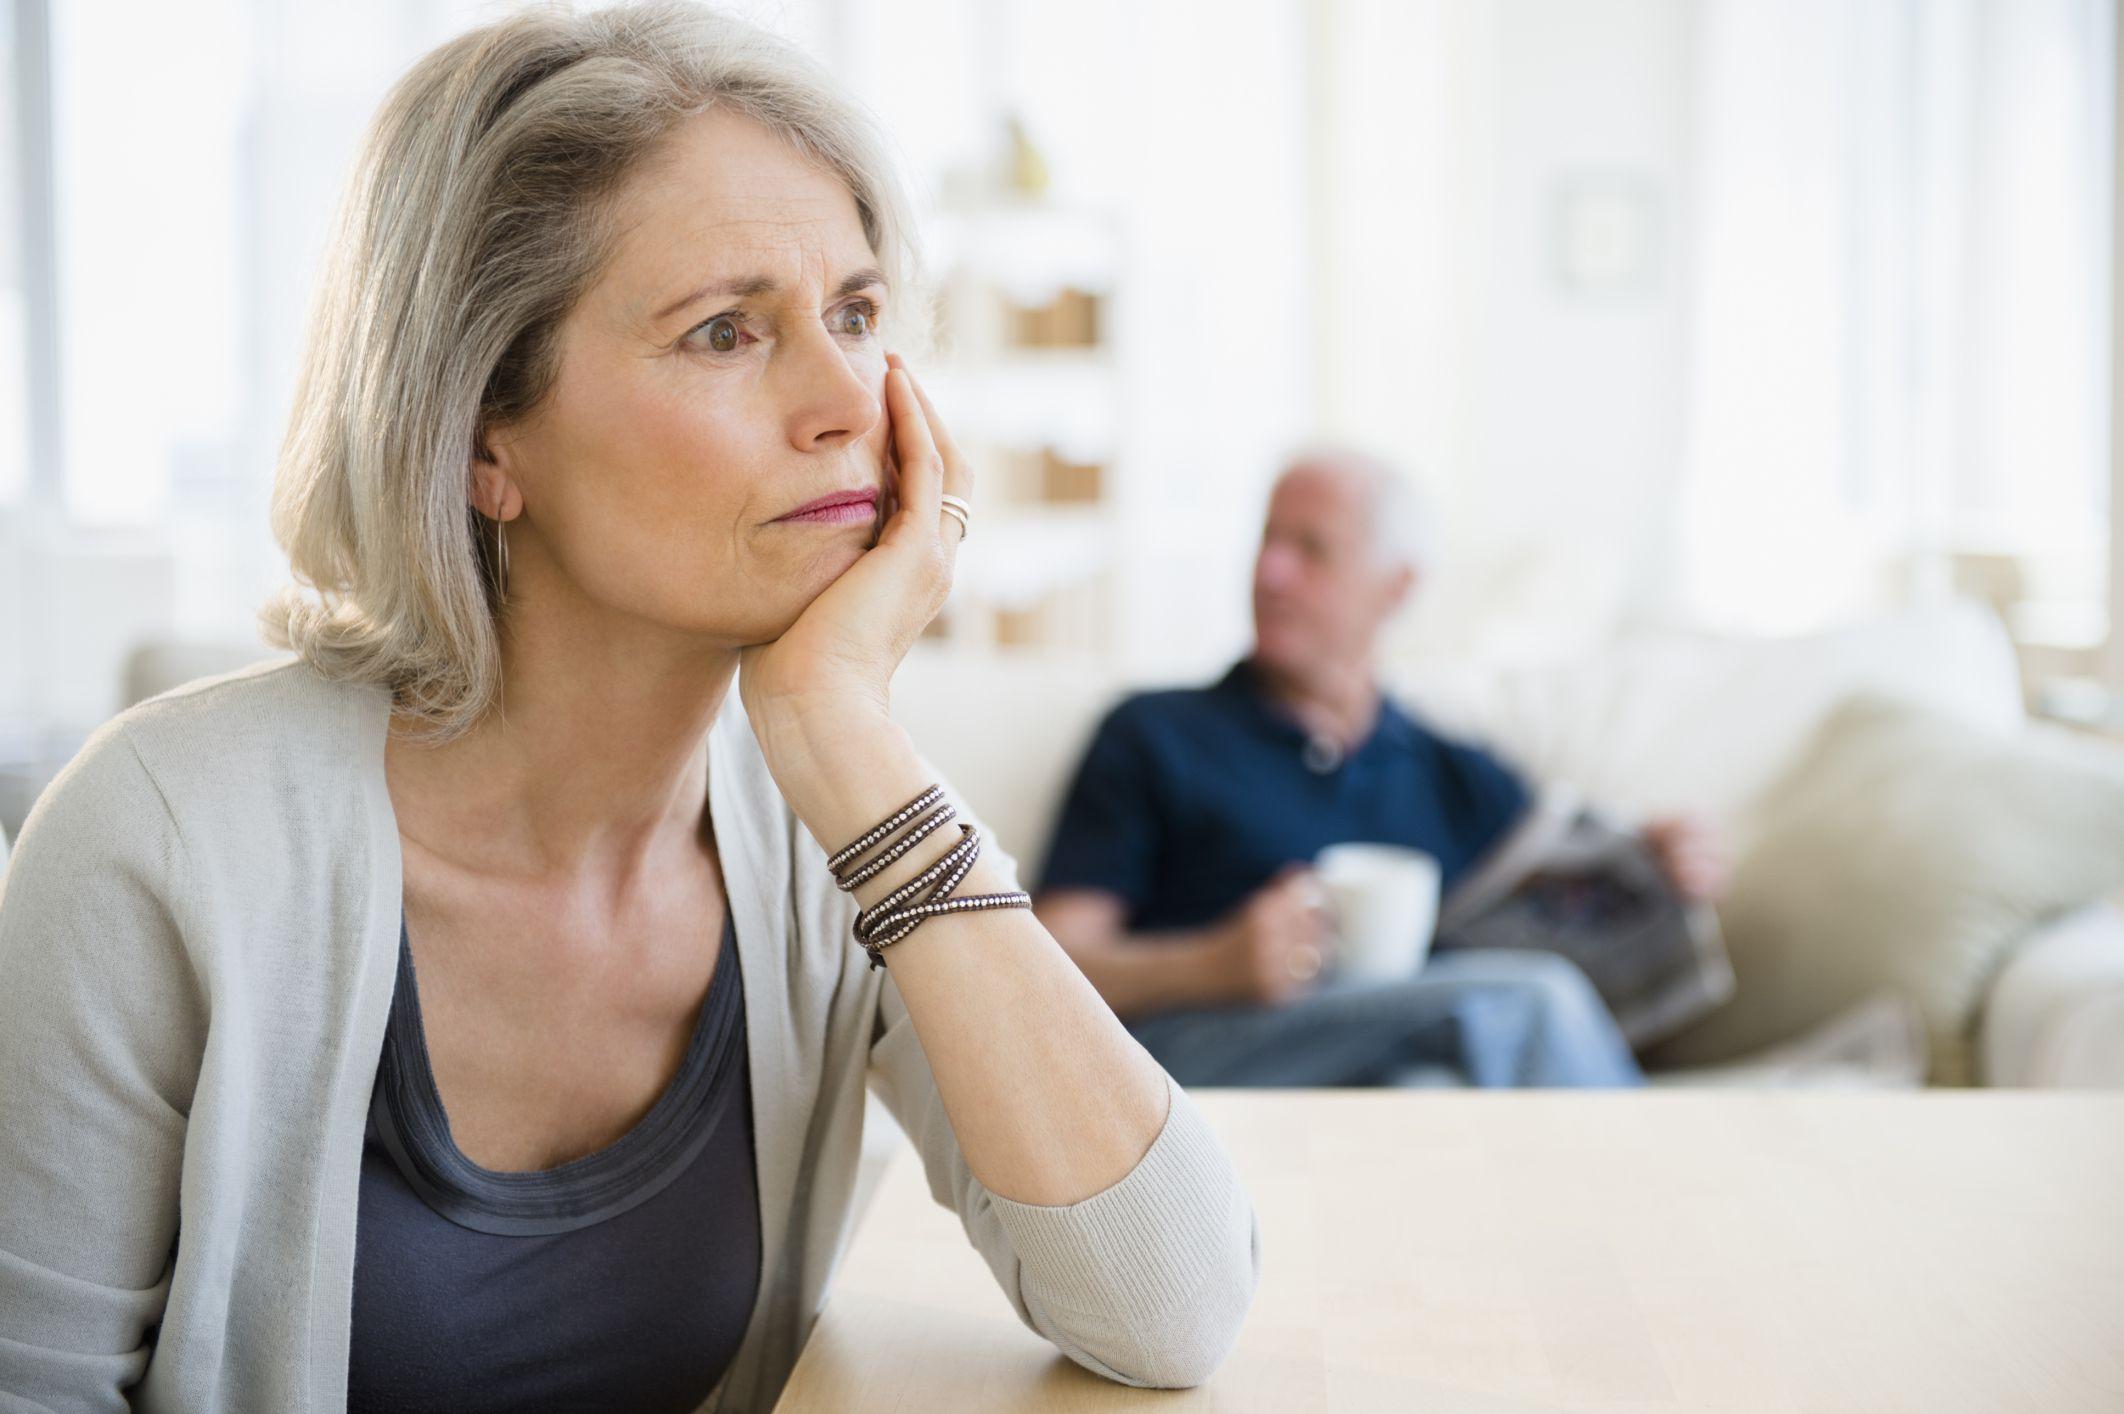 visitation rights of grandparents